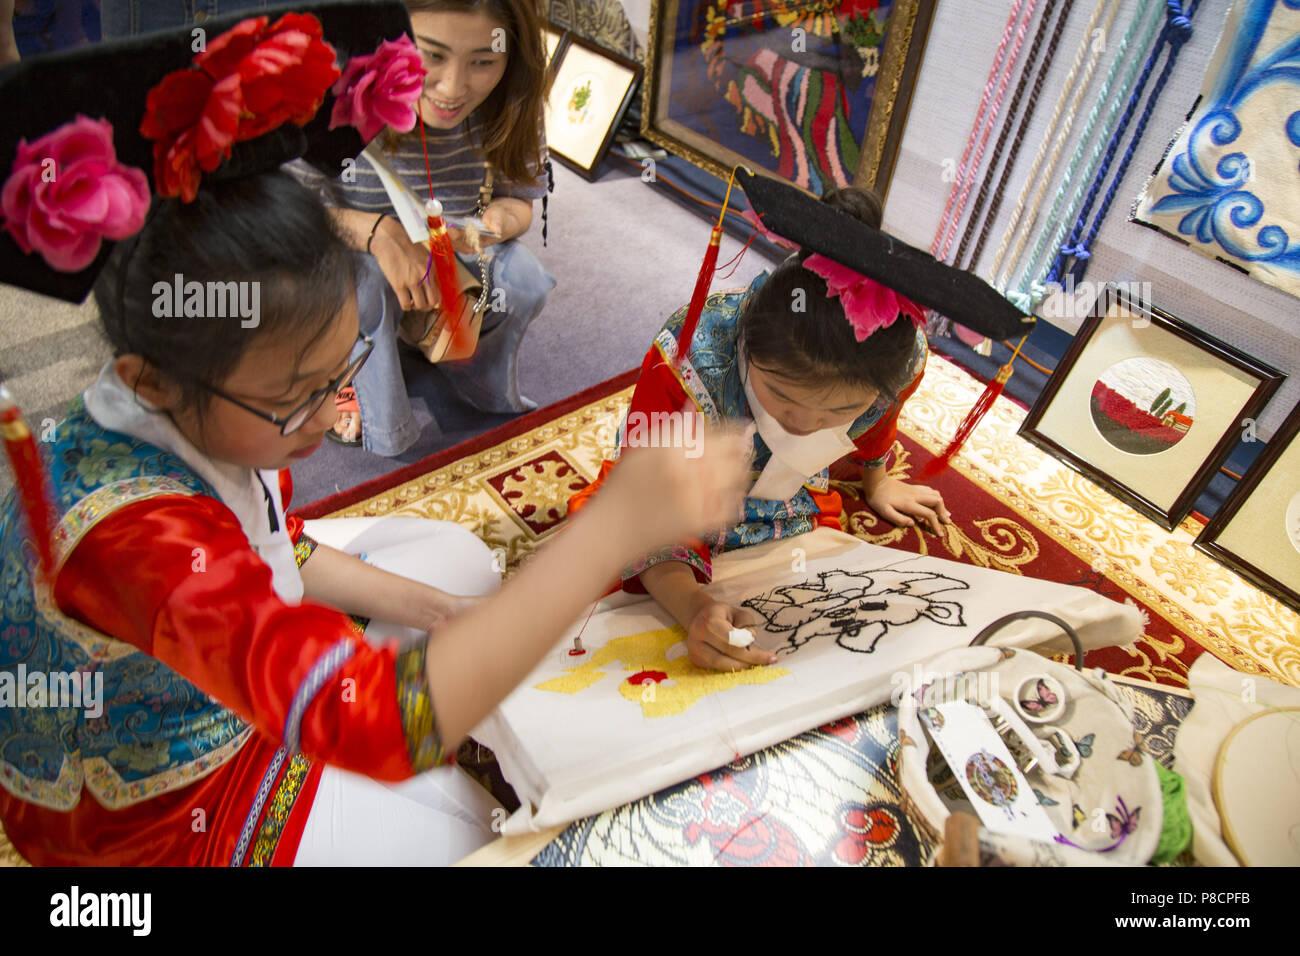 Jili, China. July 11, 2018. Pupils learn to make embroidery in northeast China's Jilin Province. Credit: SIPA Asia/ZUMA Wire/Alamy Live News - Stock Image